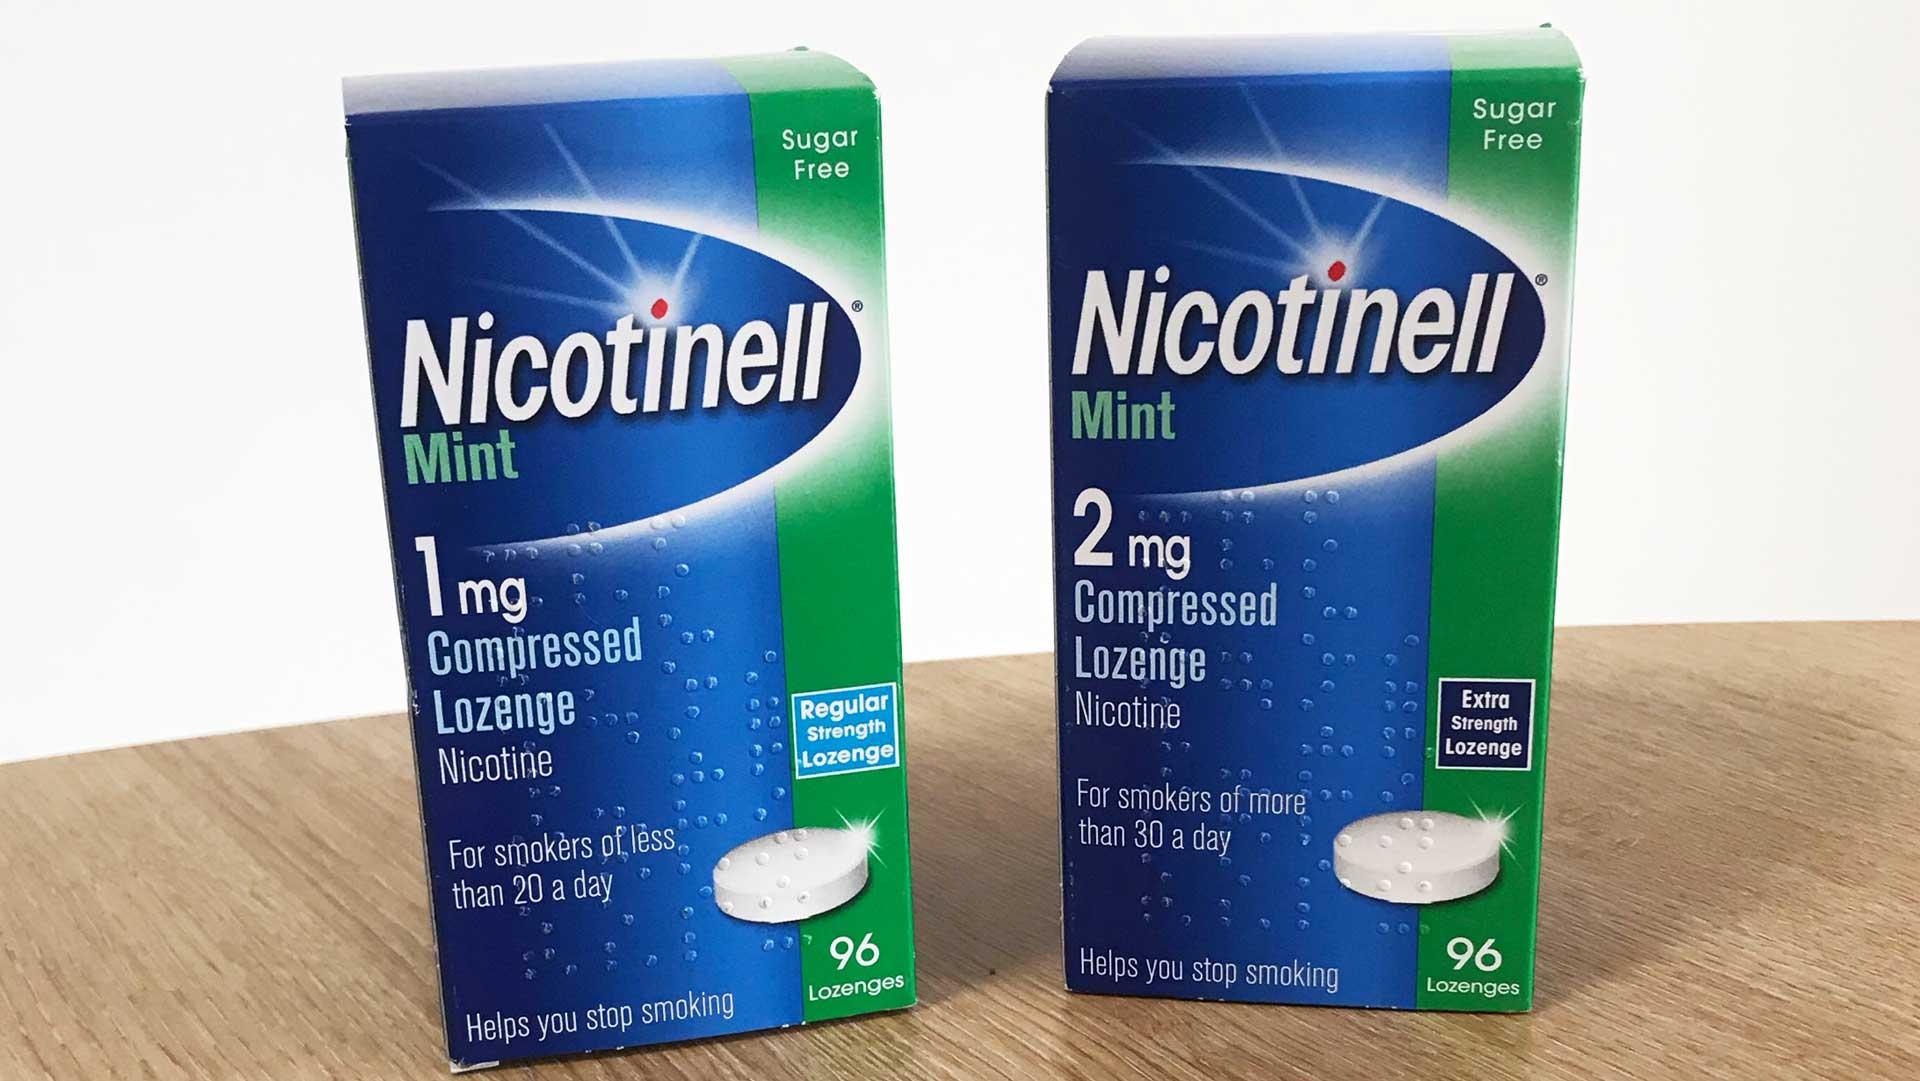 Photo of nicotine lozenges